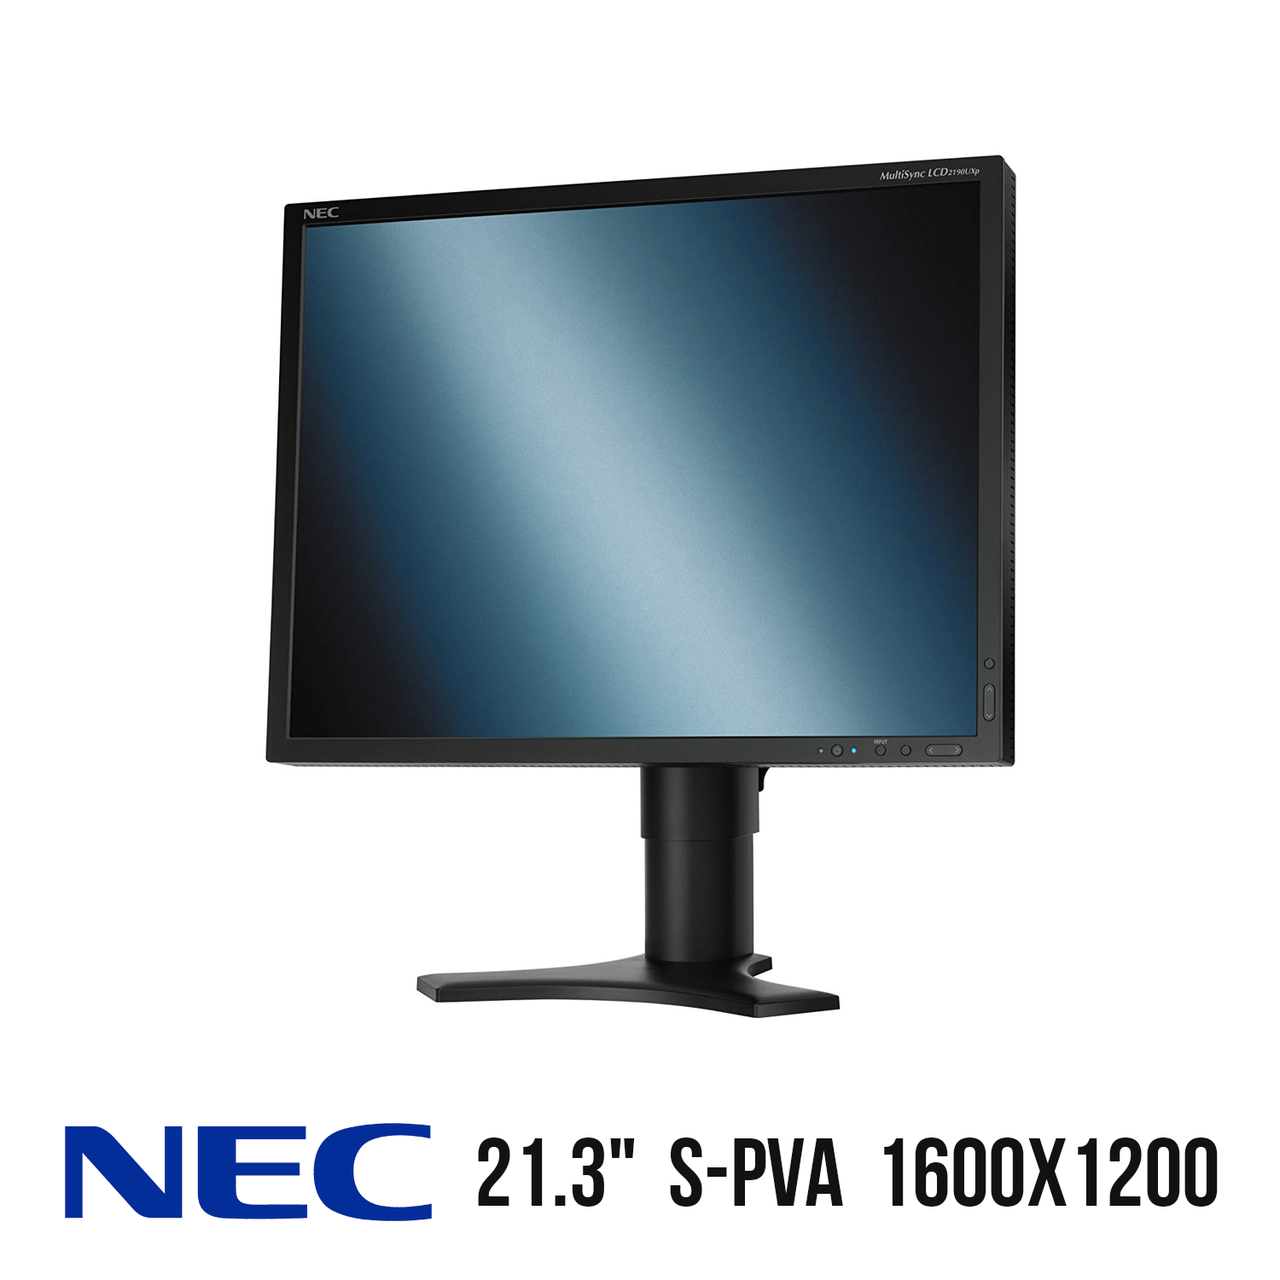 "Монитор NEC MultiSync 2190UXp / 21.3"" / 1600x1200 (4.3) / AC, VGA, DVI-D, DVI-I"